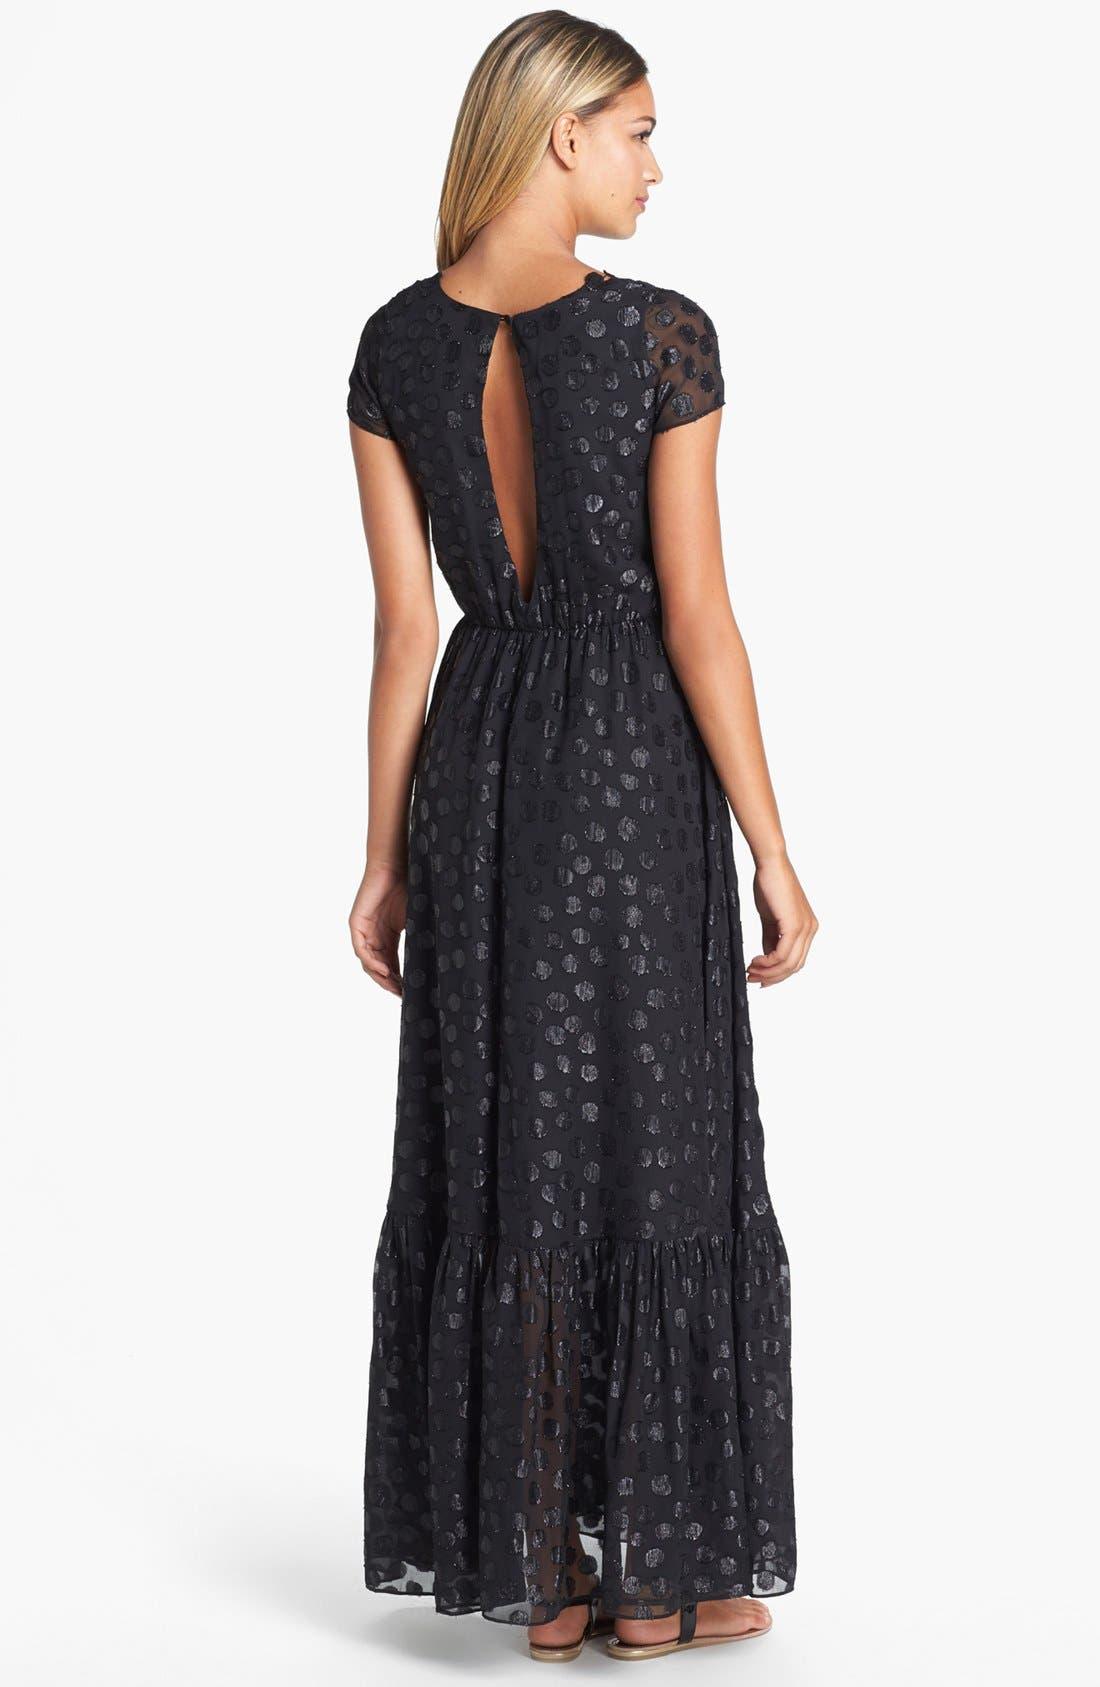 DRESS THE POPULATION, 'Evan' Metallic Dot Maxi Dress, Alternate thumbnail 2, color, 001